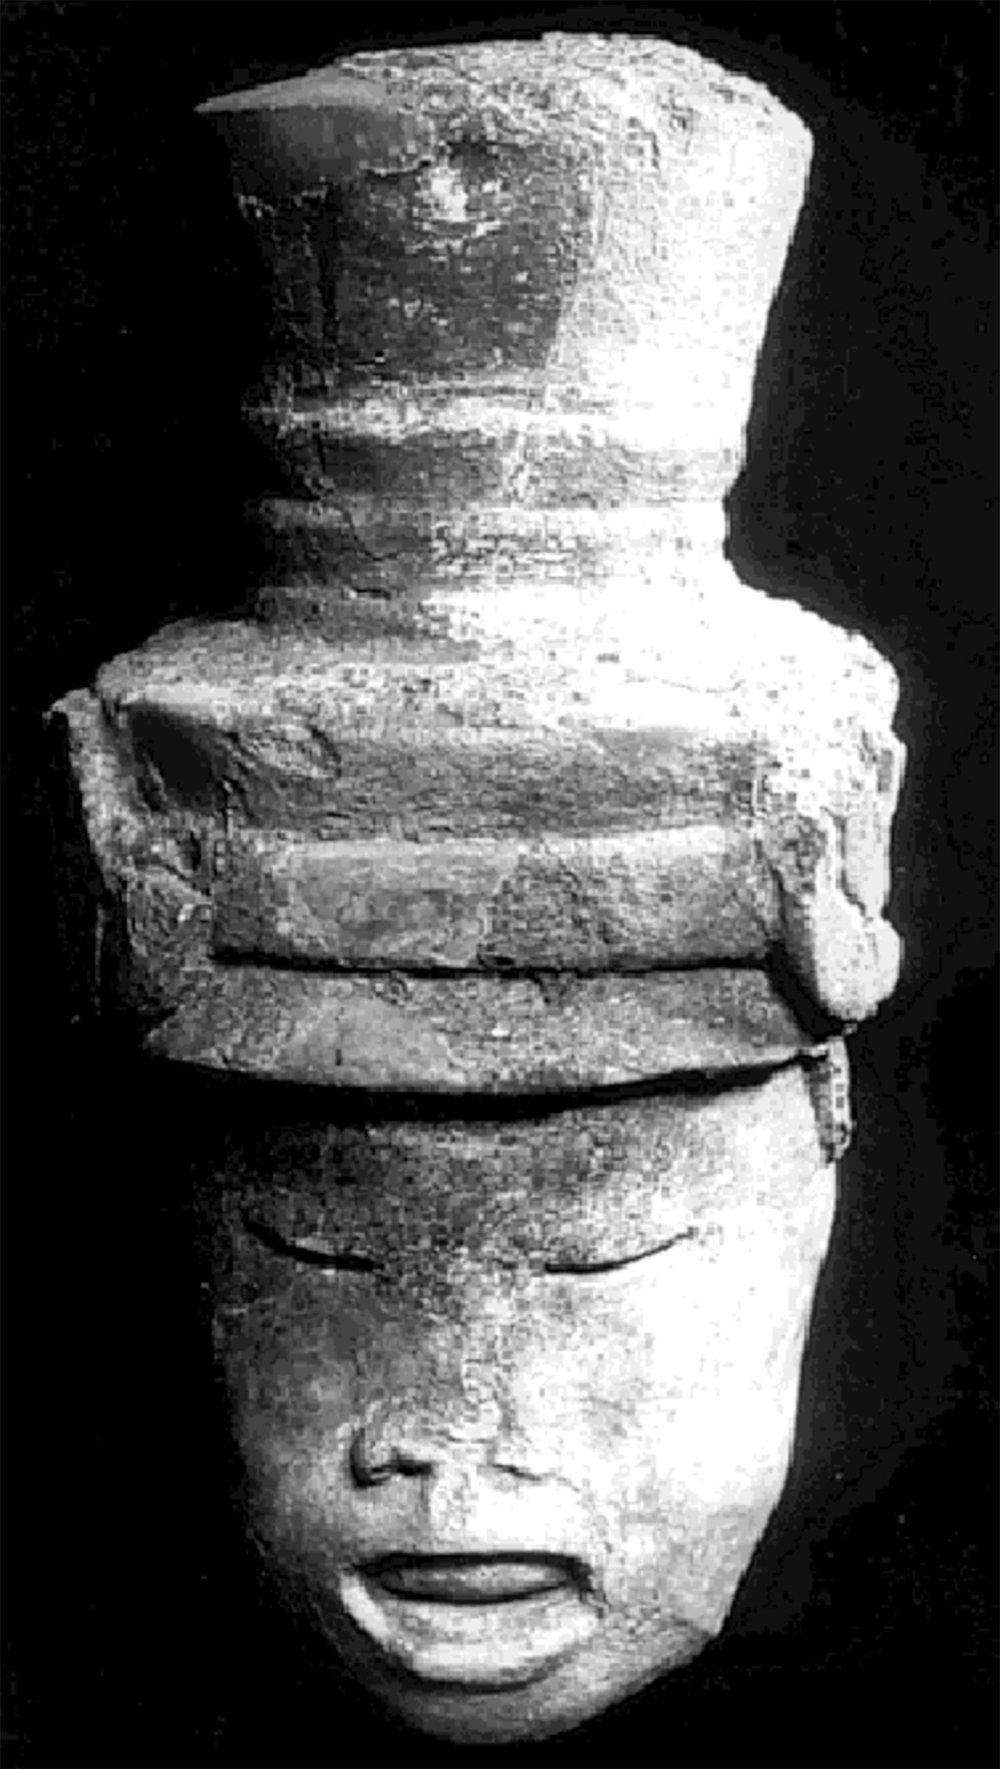 Deity head of Xipe Totec, a god associated with human sacrifice among the Aztecs. Source:  researchgate.net .